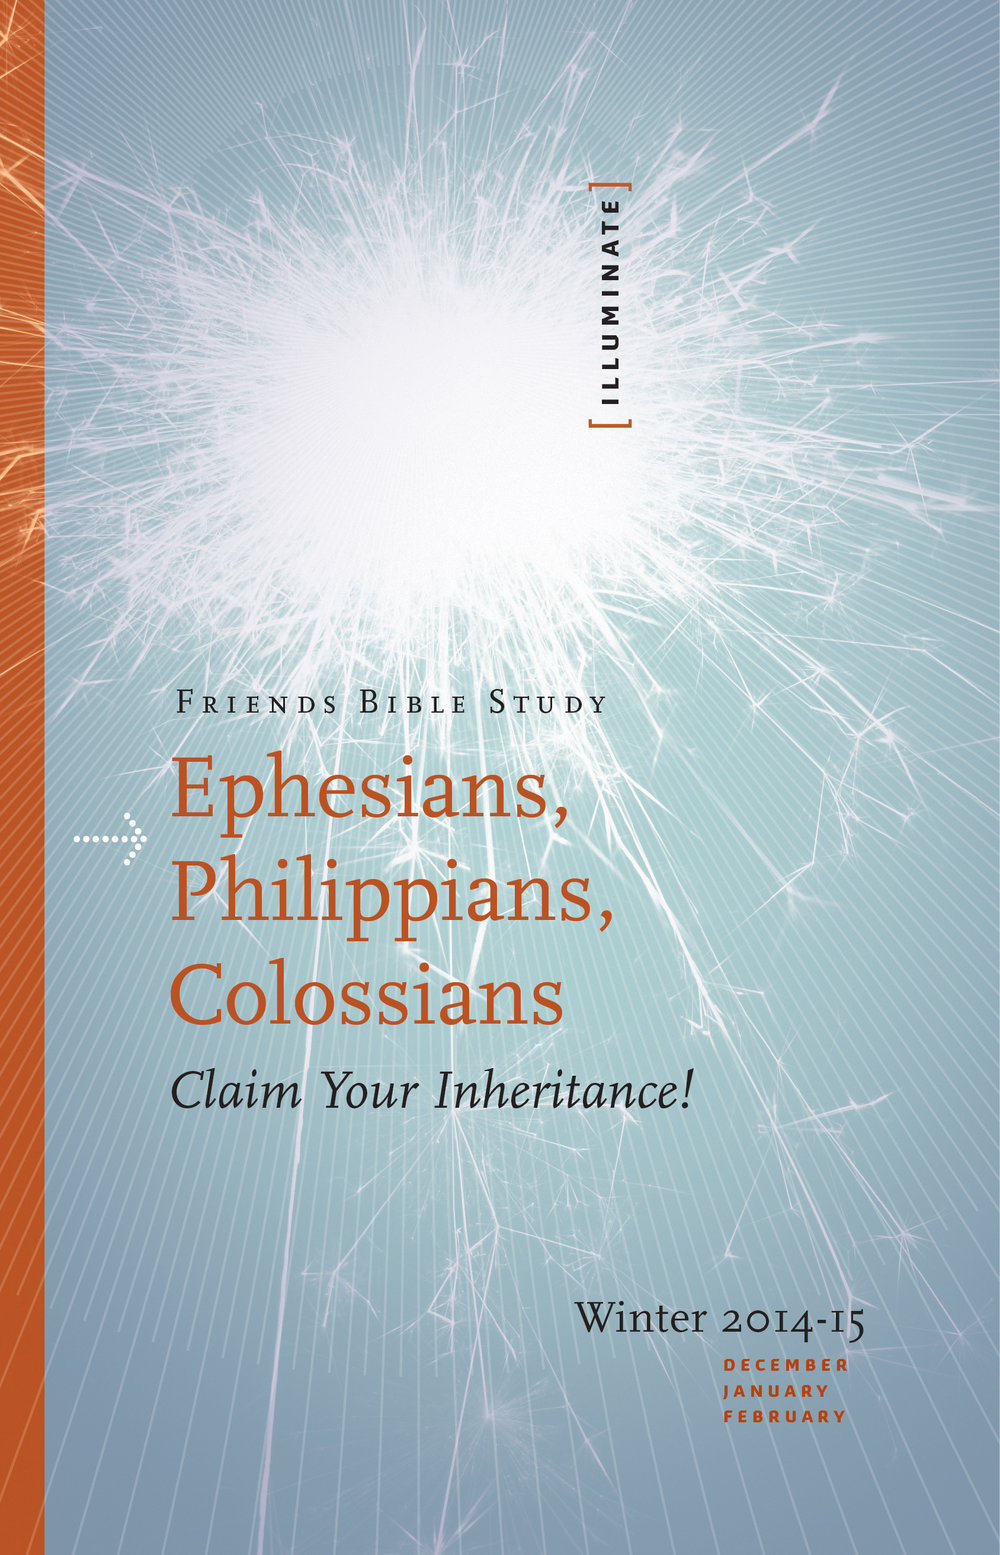 Ephesians, Philippians, Colossians